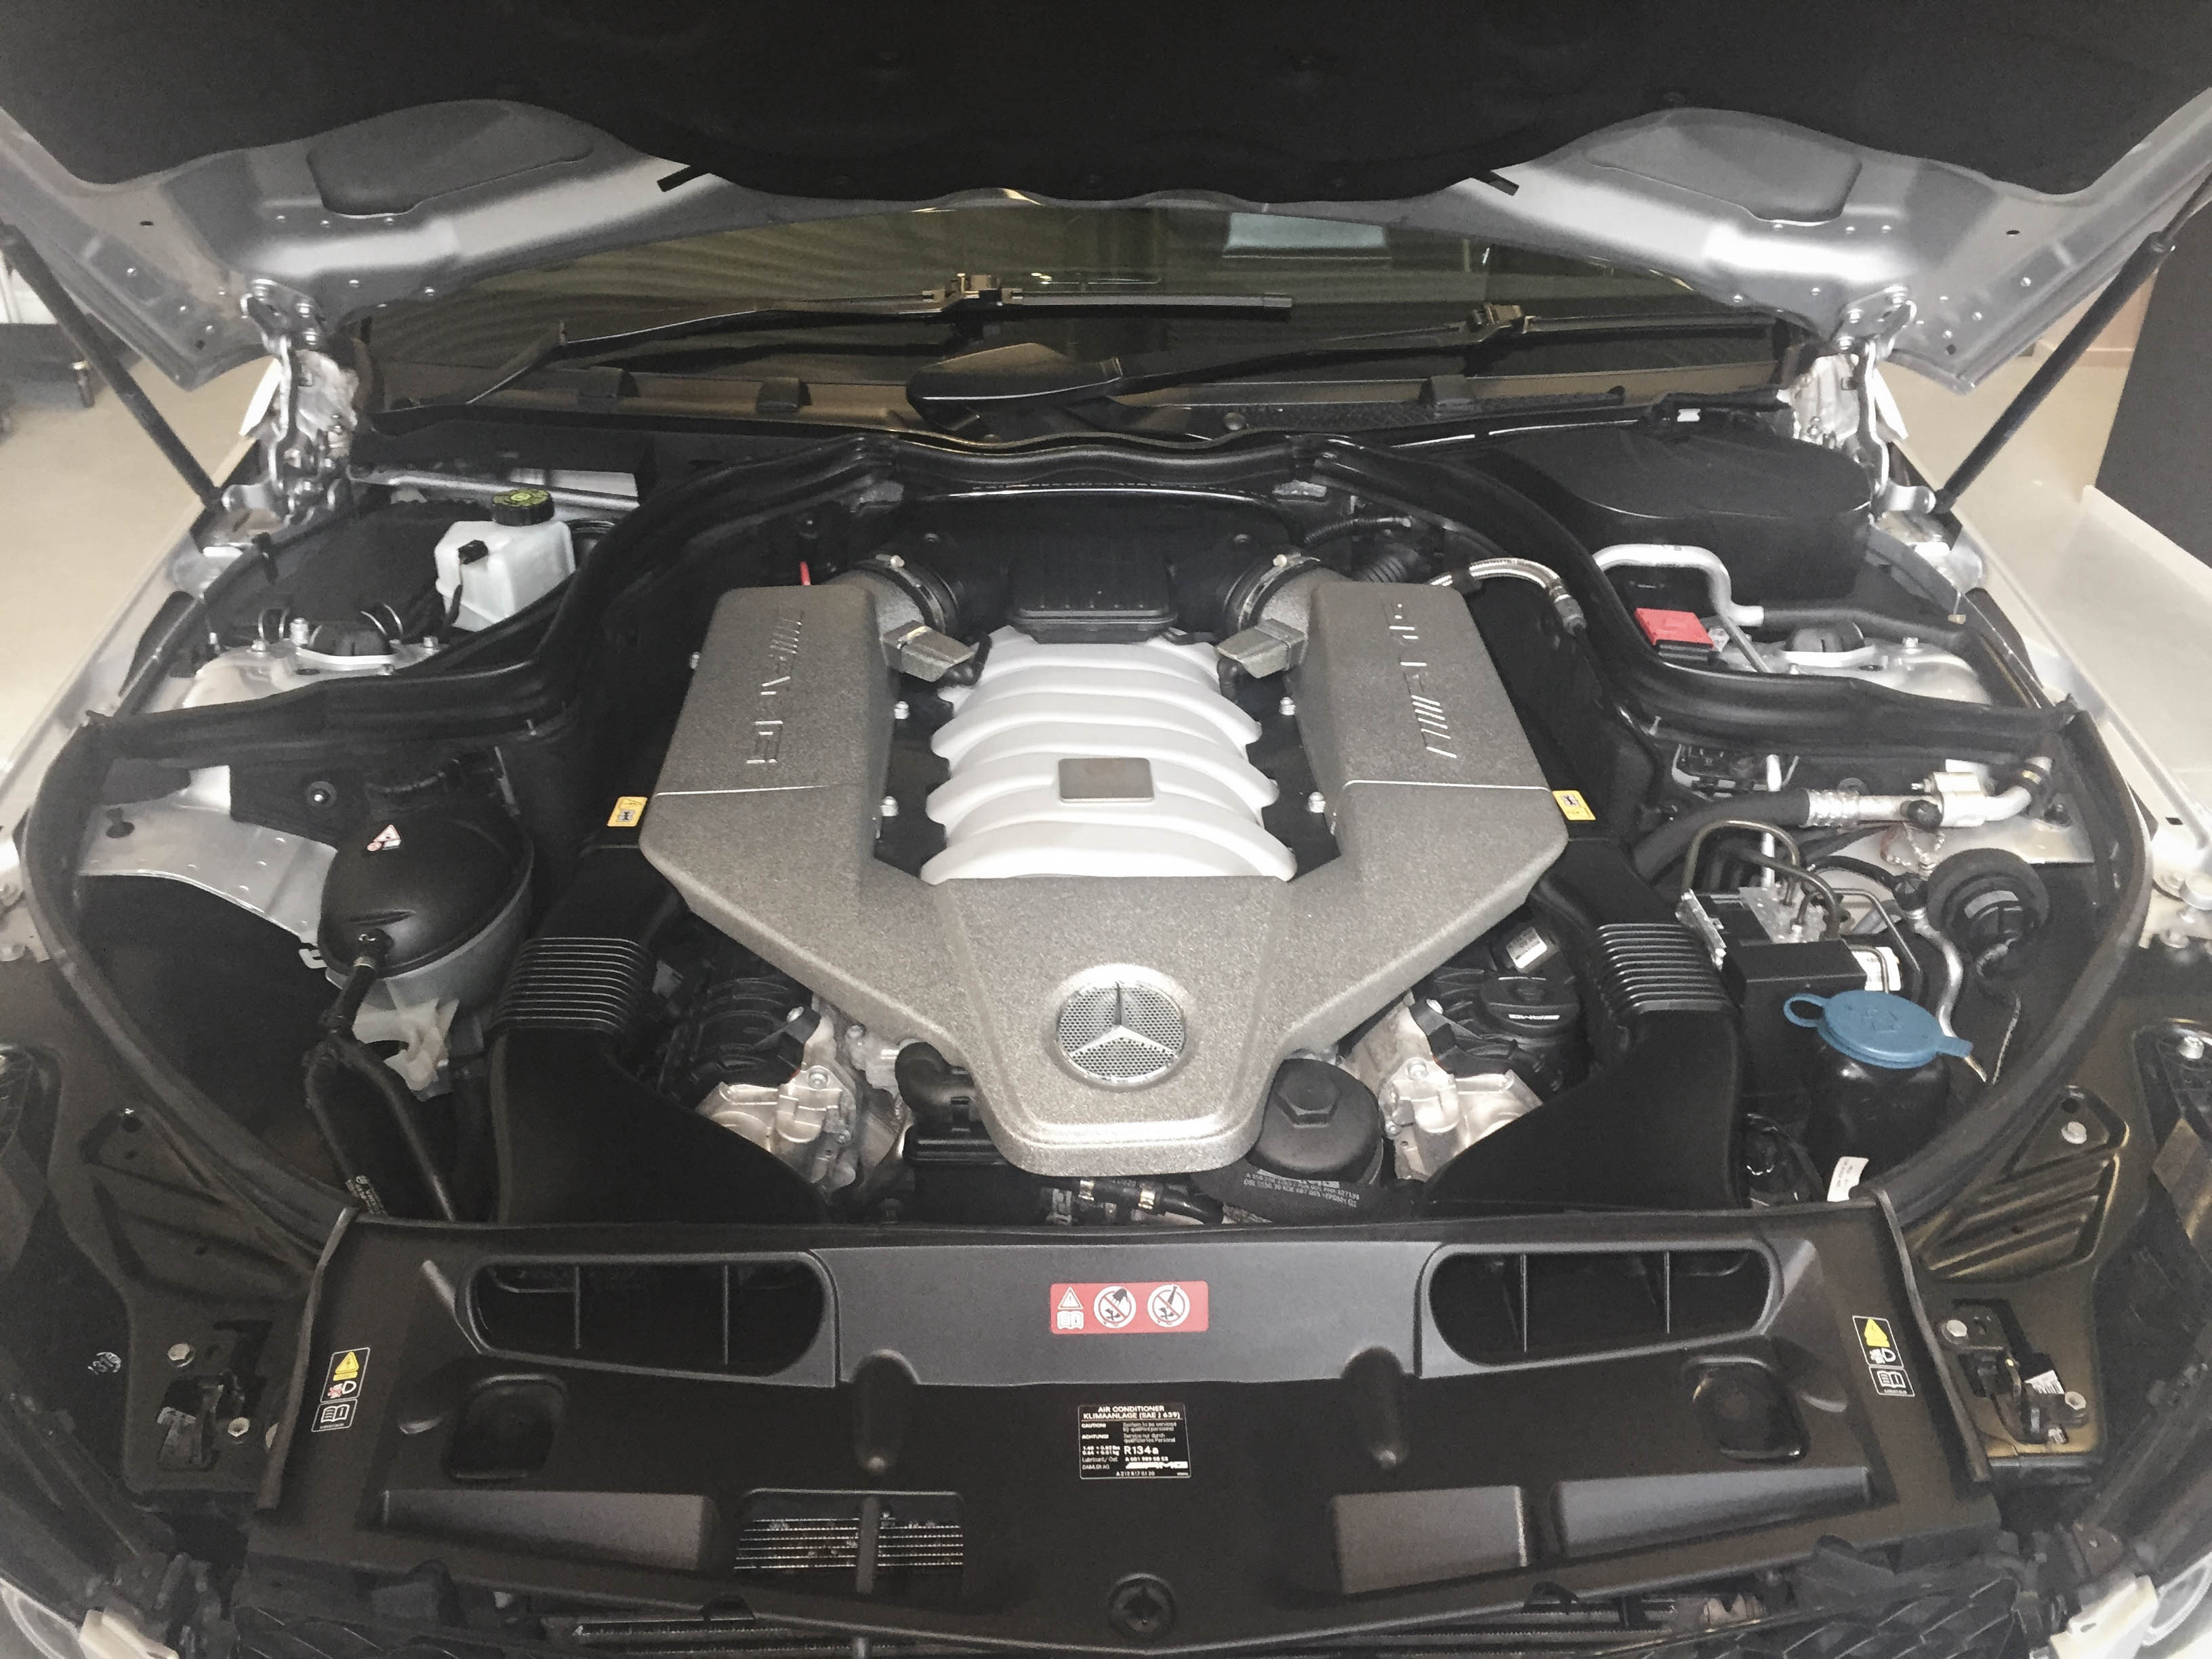 Mercedes C63 AMG – Engine